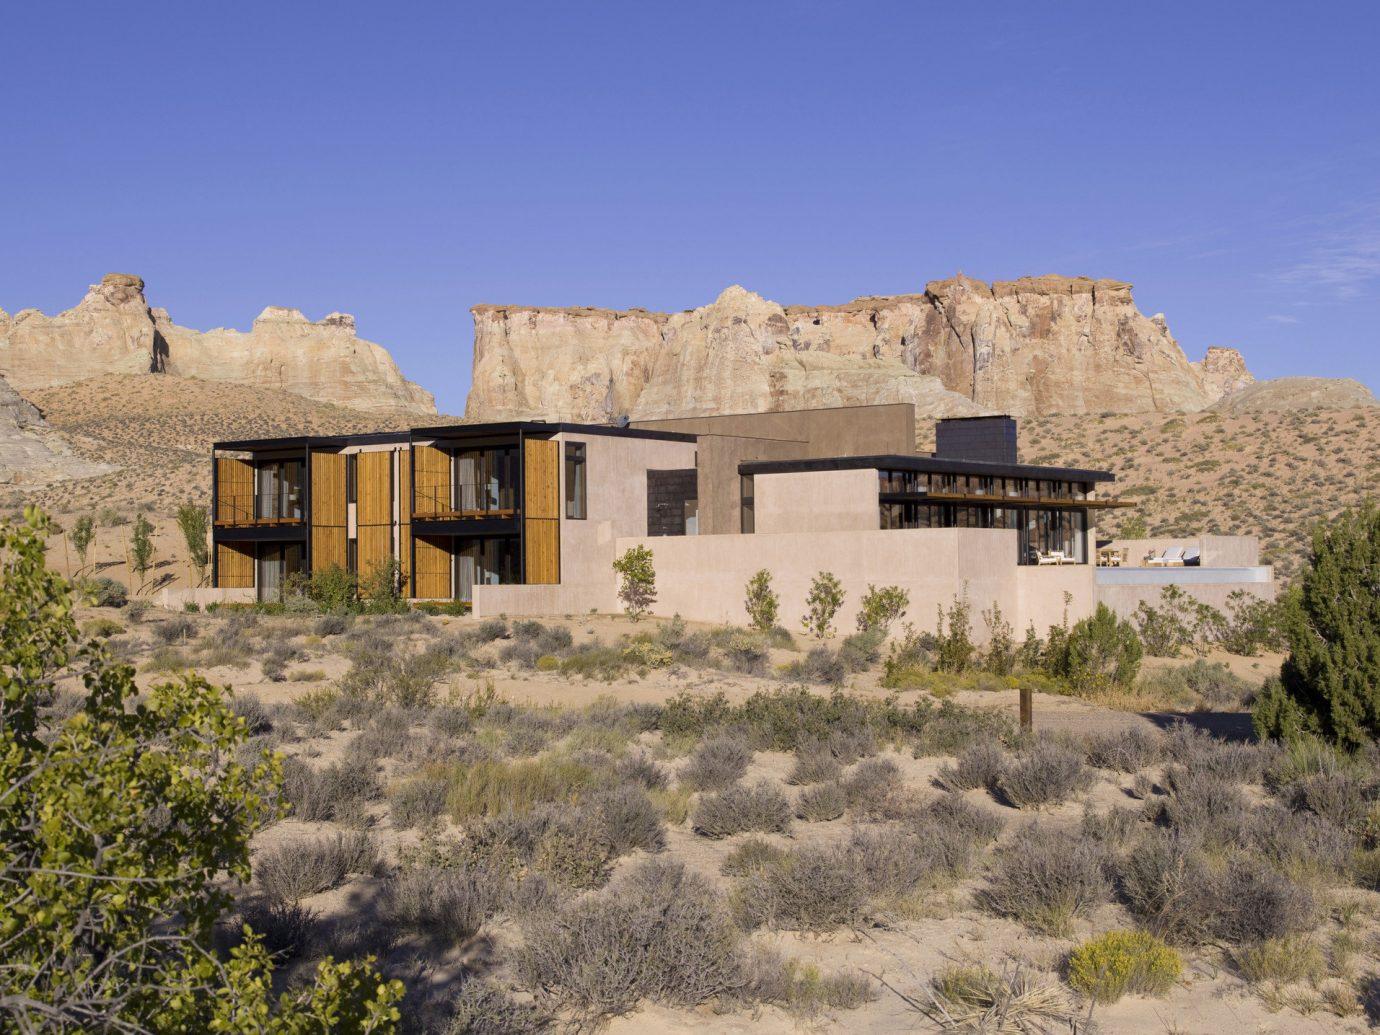 Trip Ideas sky outdoor grass property mountain natural environment house estate home landscape Village Ruins terrain ruin plant stone